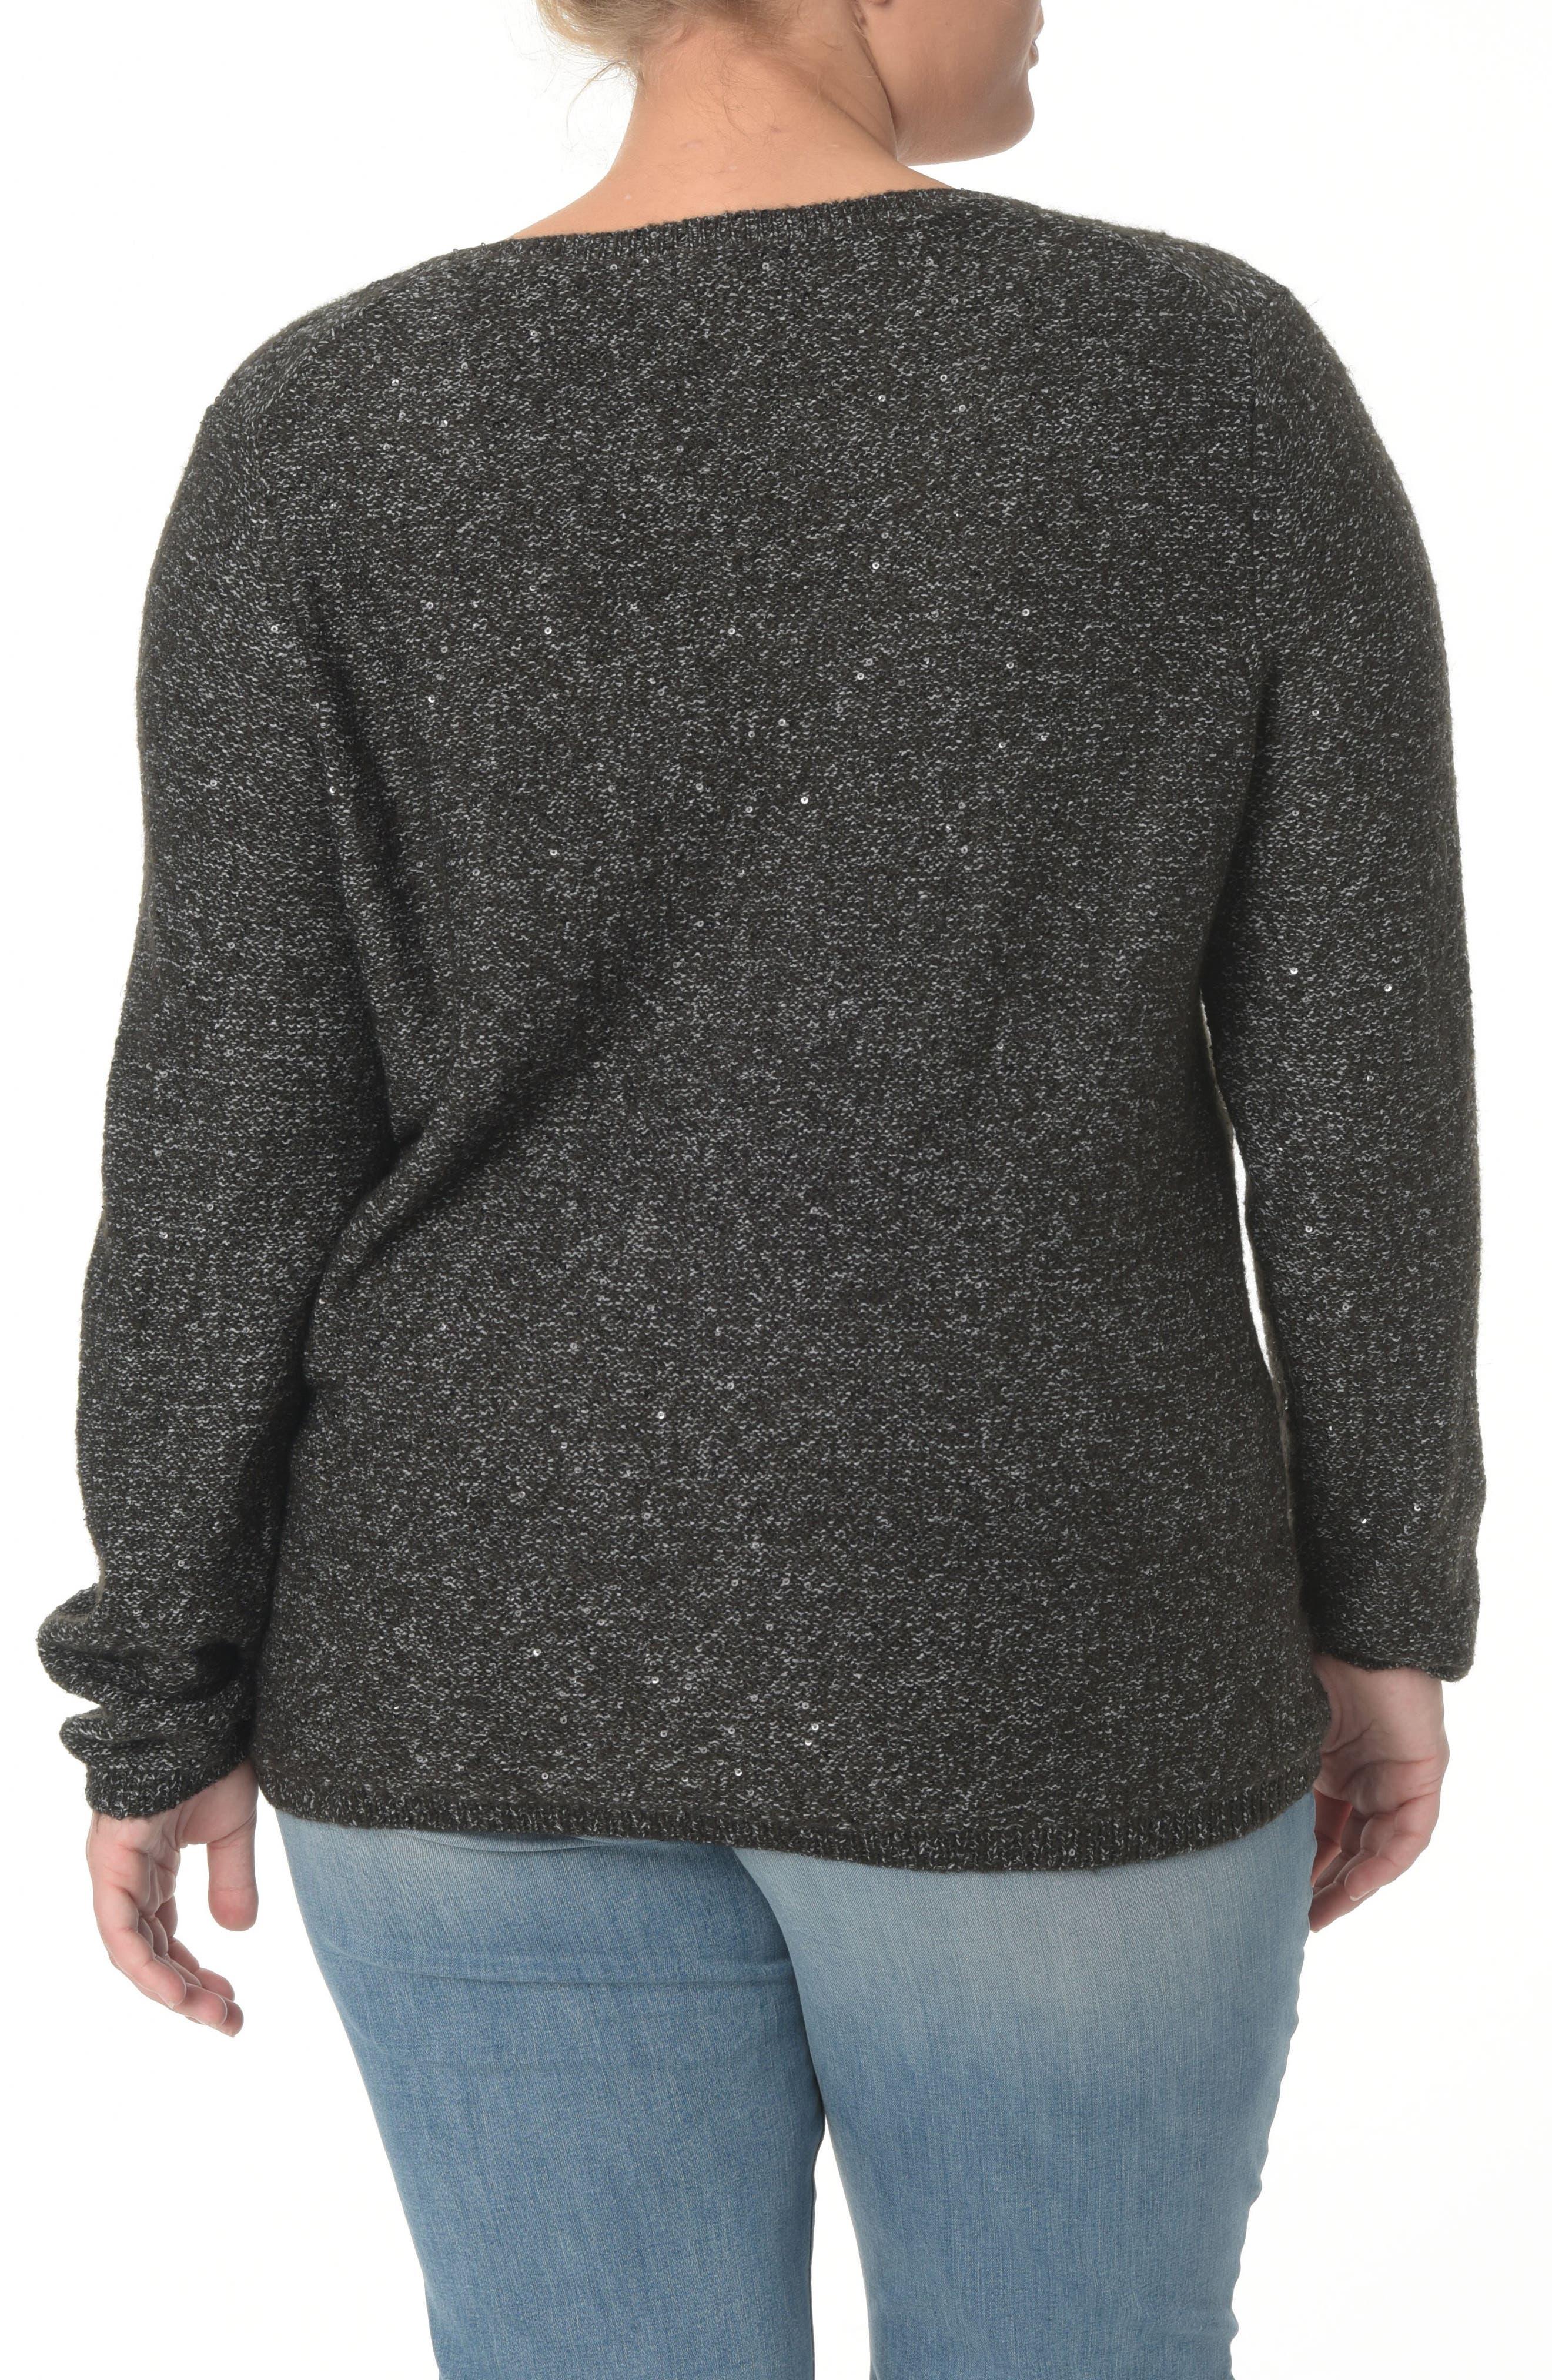 Sequin Scoop Neck Sweater,                             Alternate thumbnail 2, color,                             BLACK